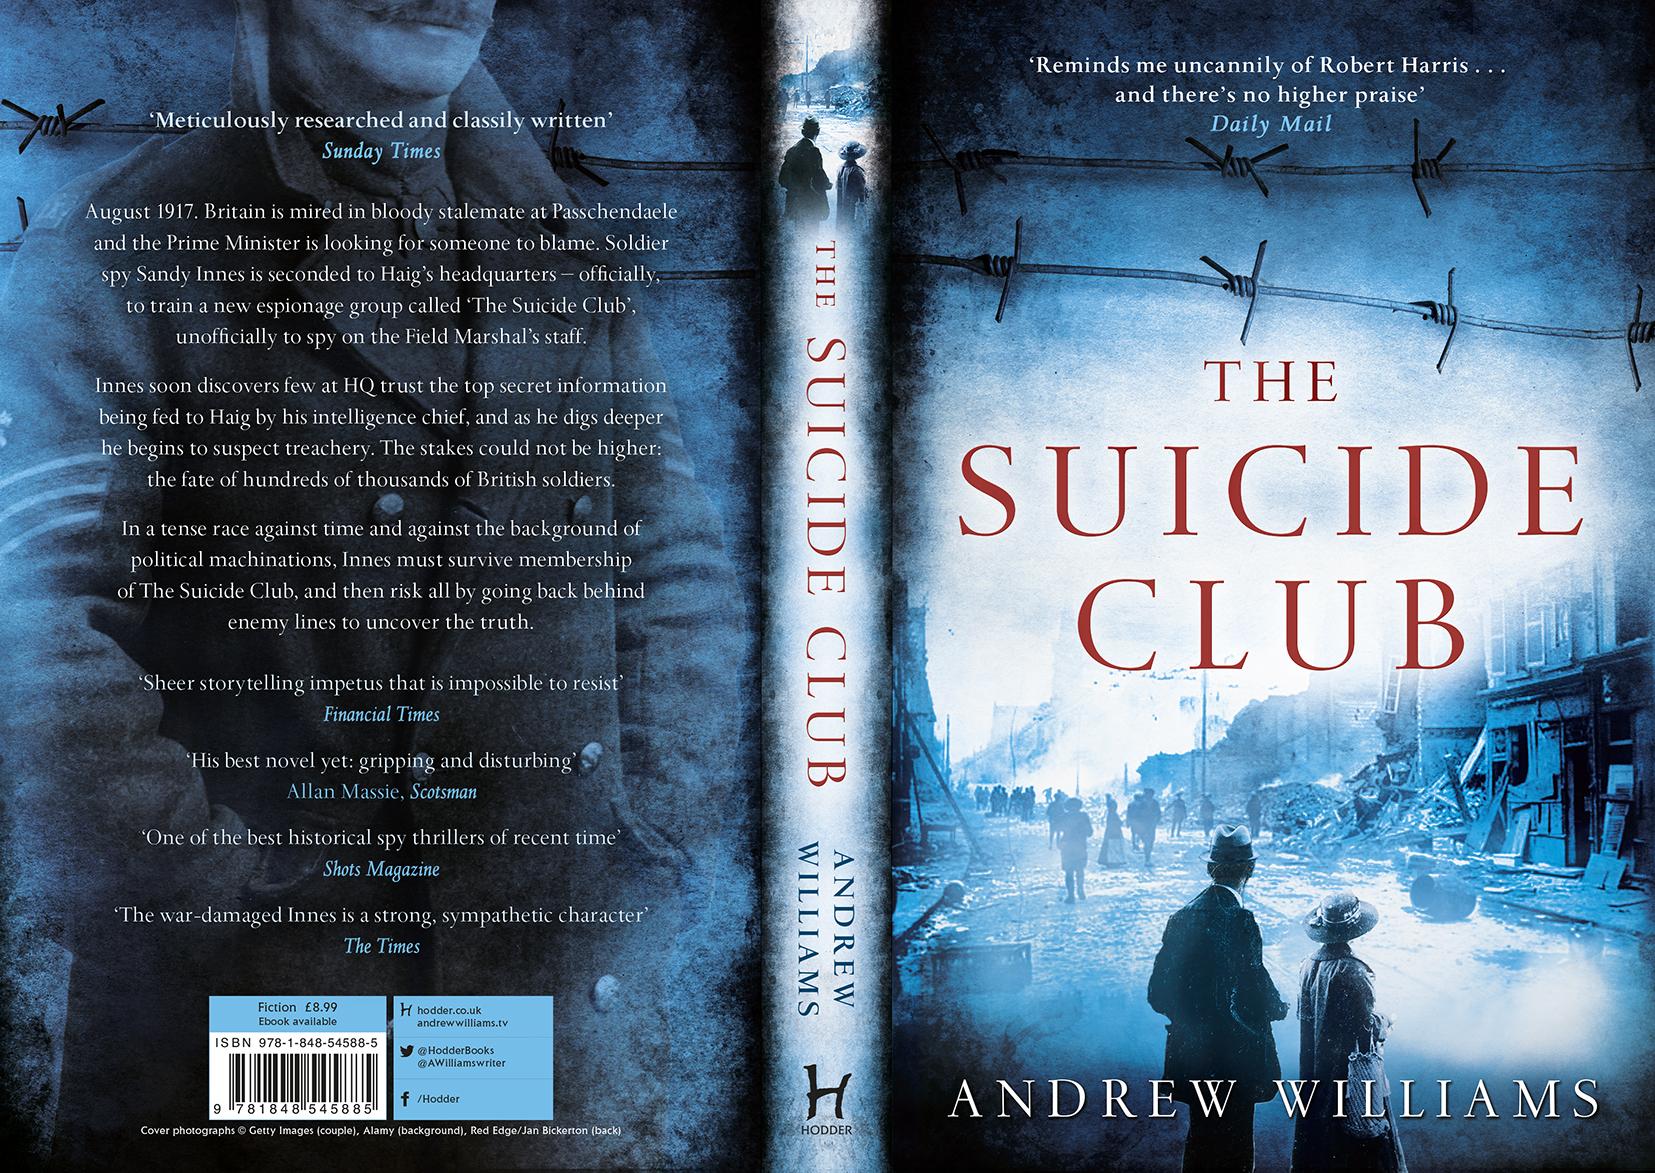 1805_SuicideClub_Bpb.indd